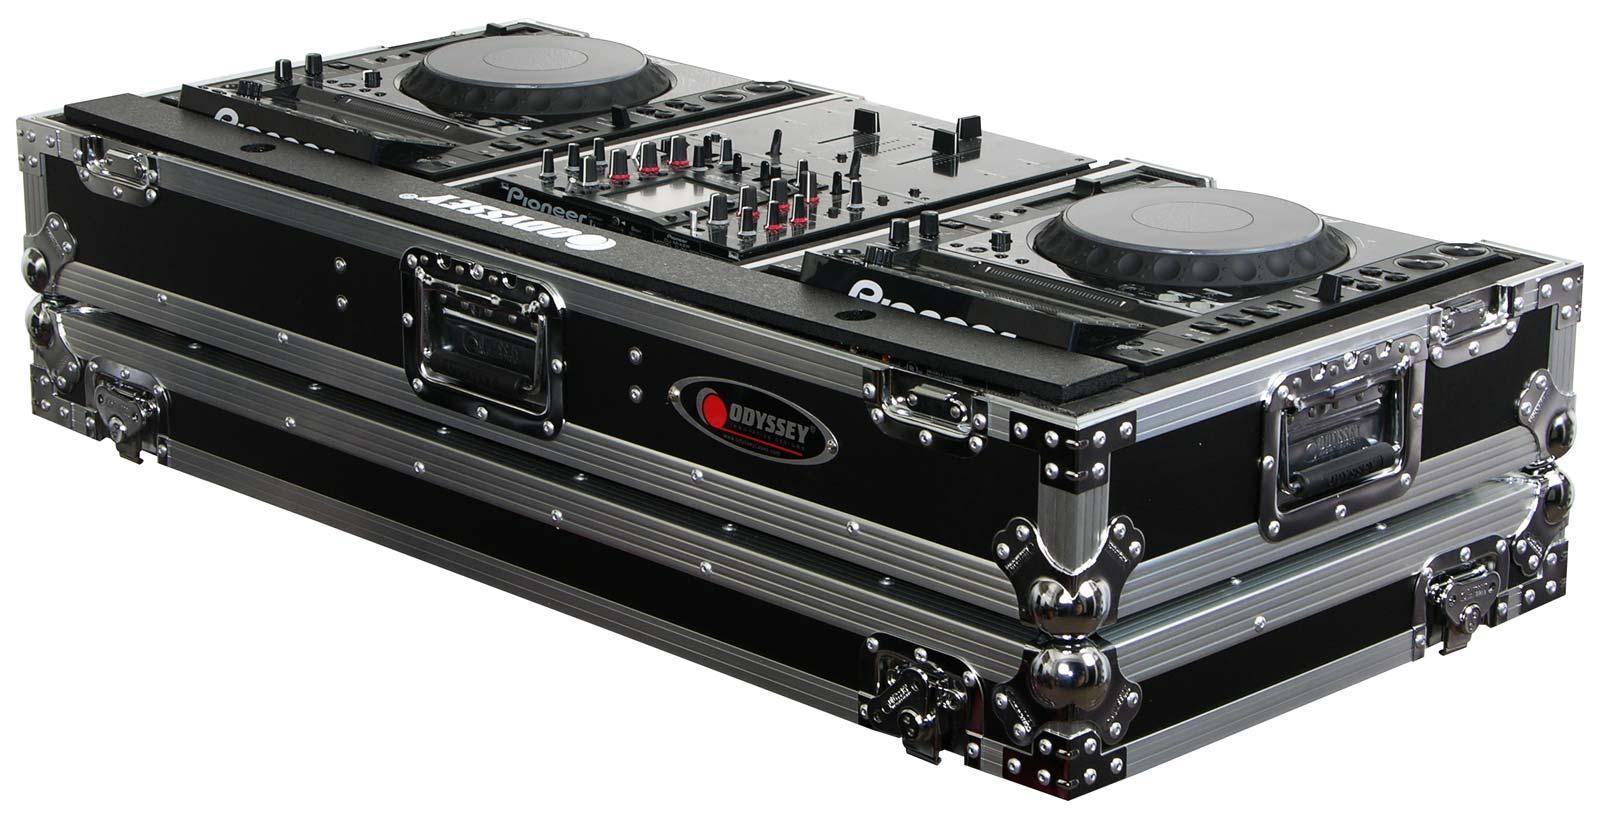 odyssey fz10cdjw flight zone dj coffin 2 cd players 10 mixer agiprodj. Black Bedroom Furniture Sets. Home Design Ideas